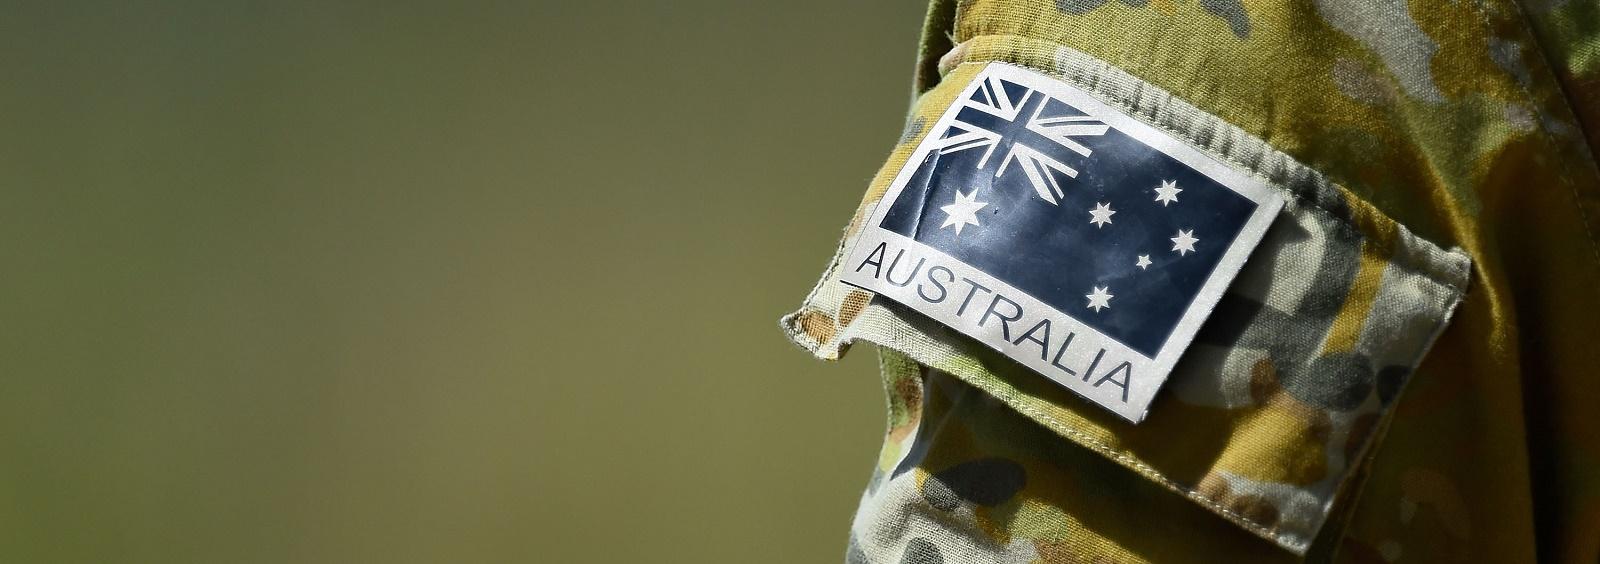 Australian flag patch worn by an Australian RAAF member (Photo: Ian Hitchcock/Getty Images)